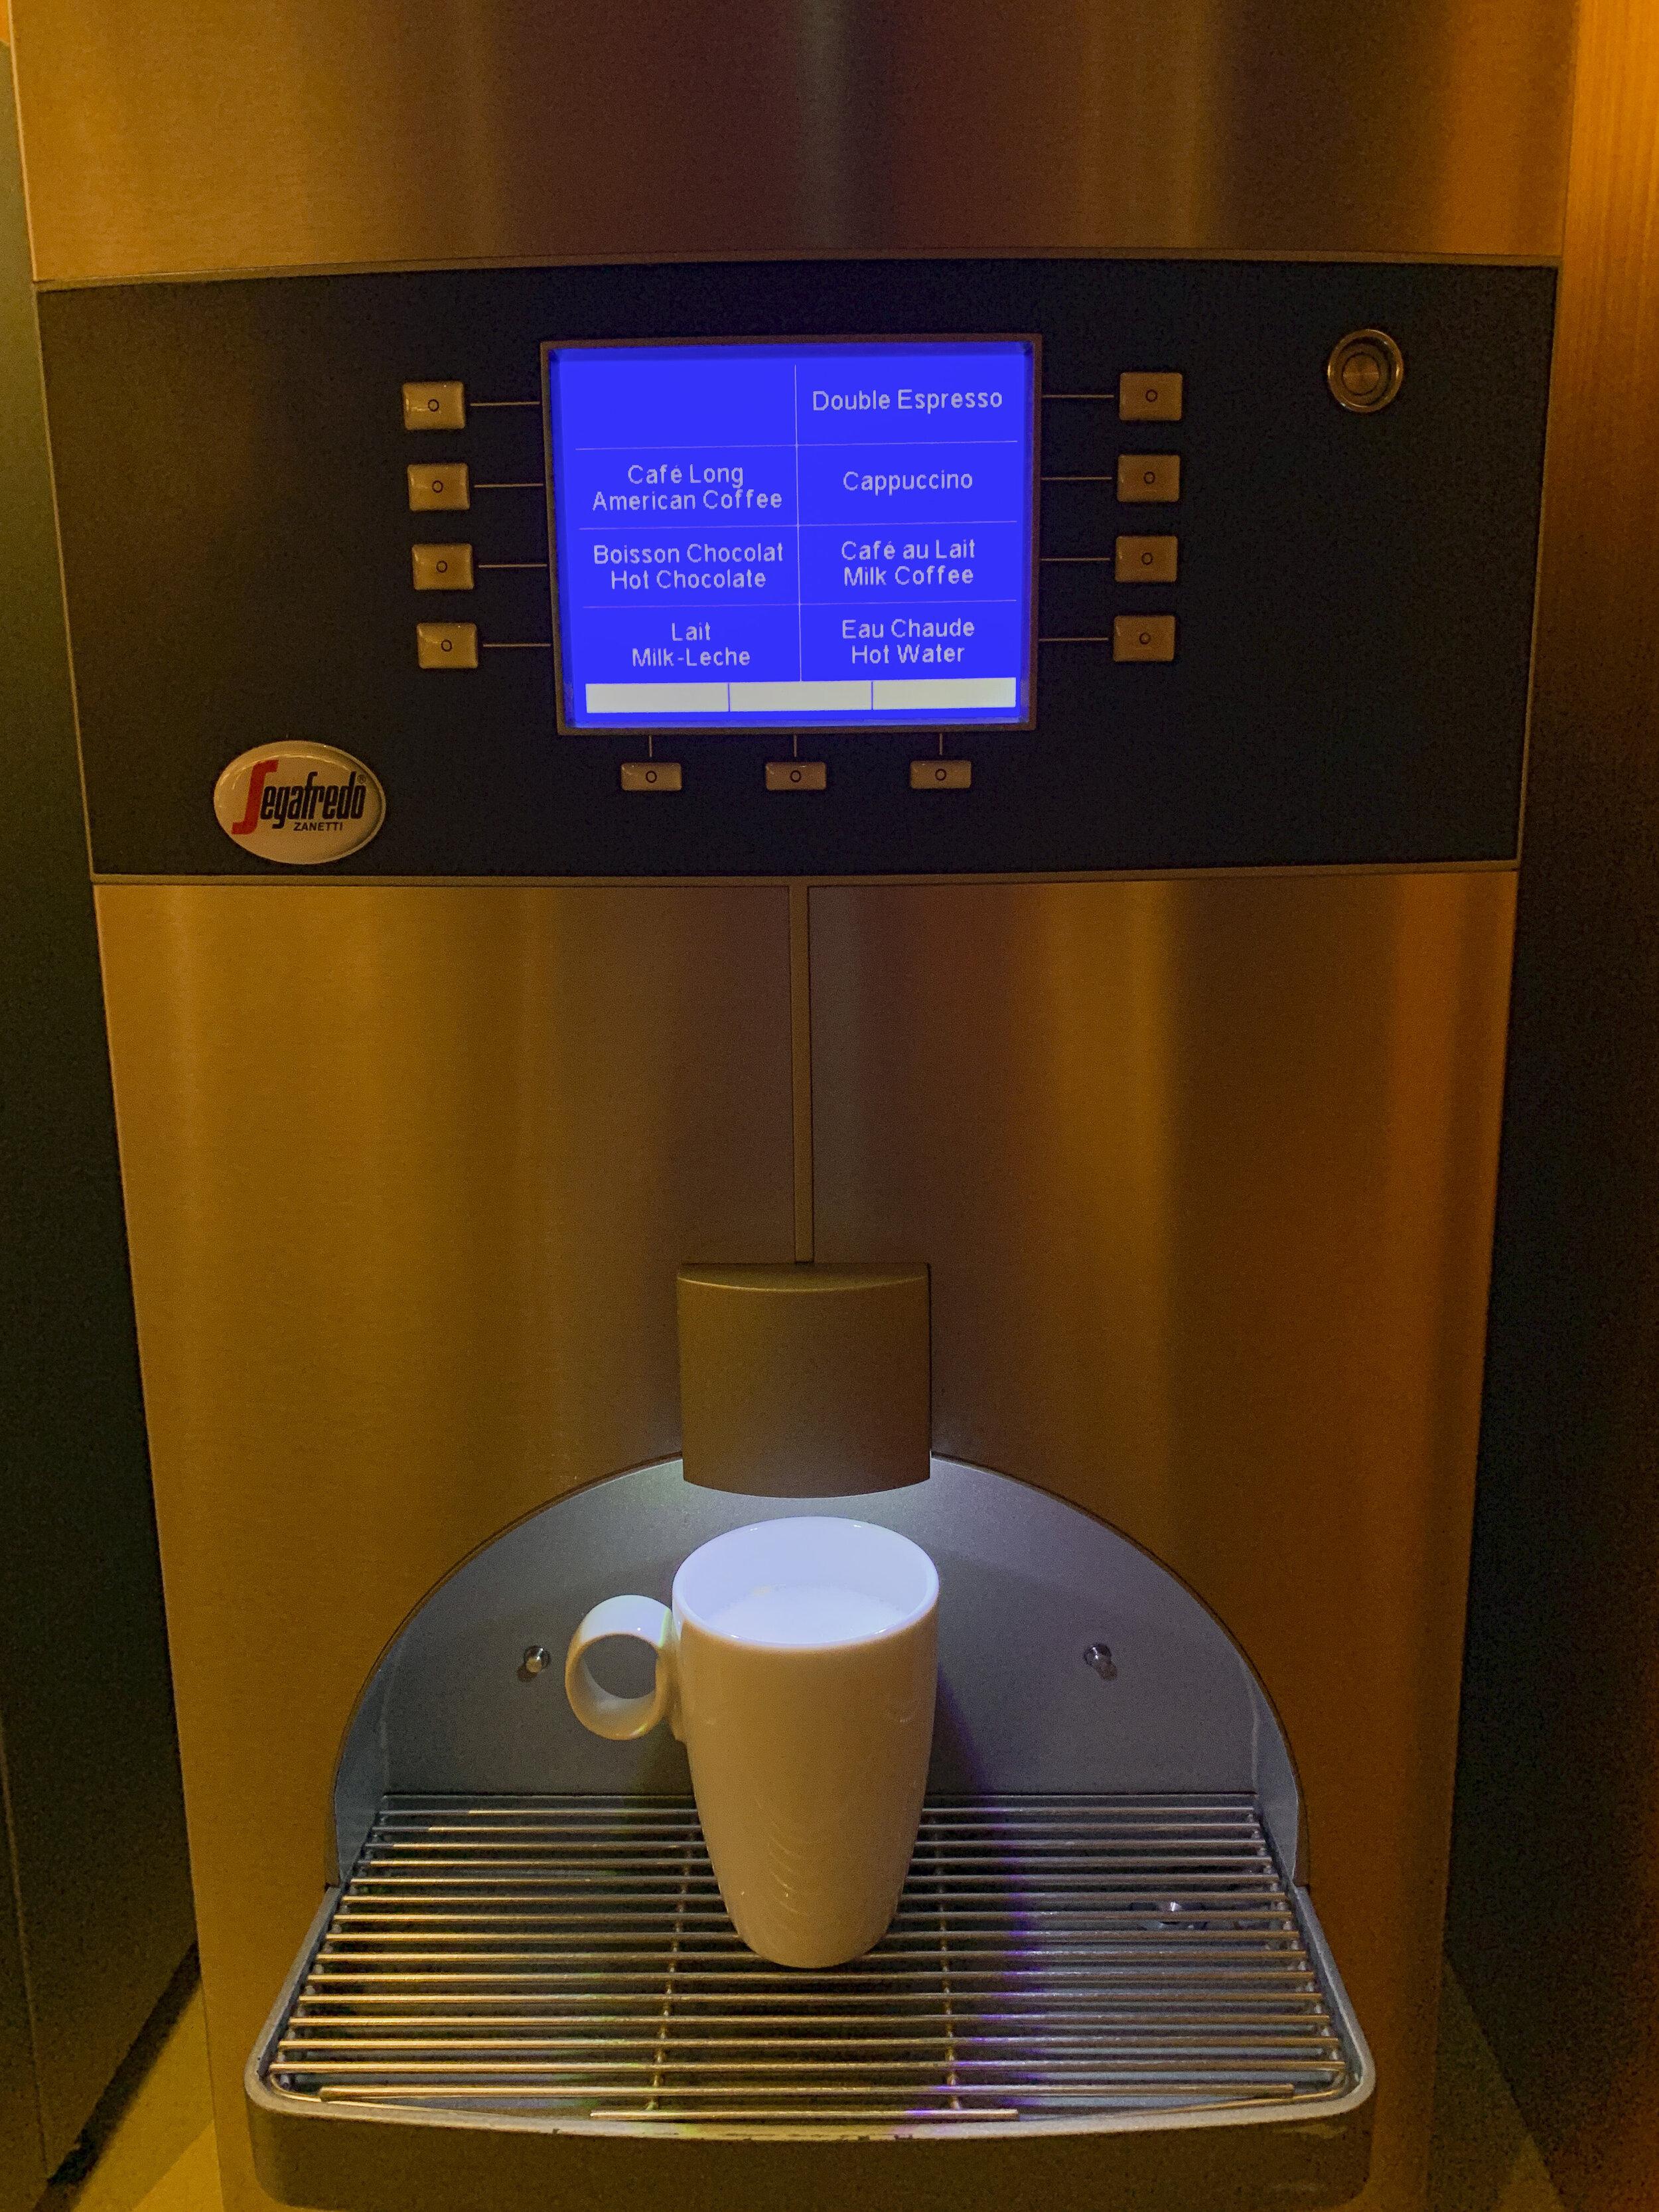 The coffee machine was really good.